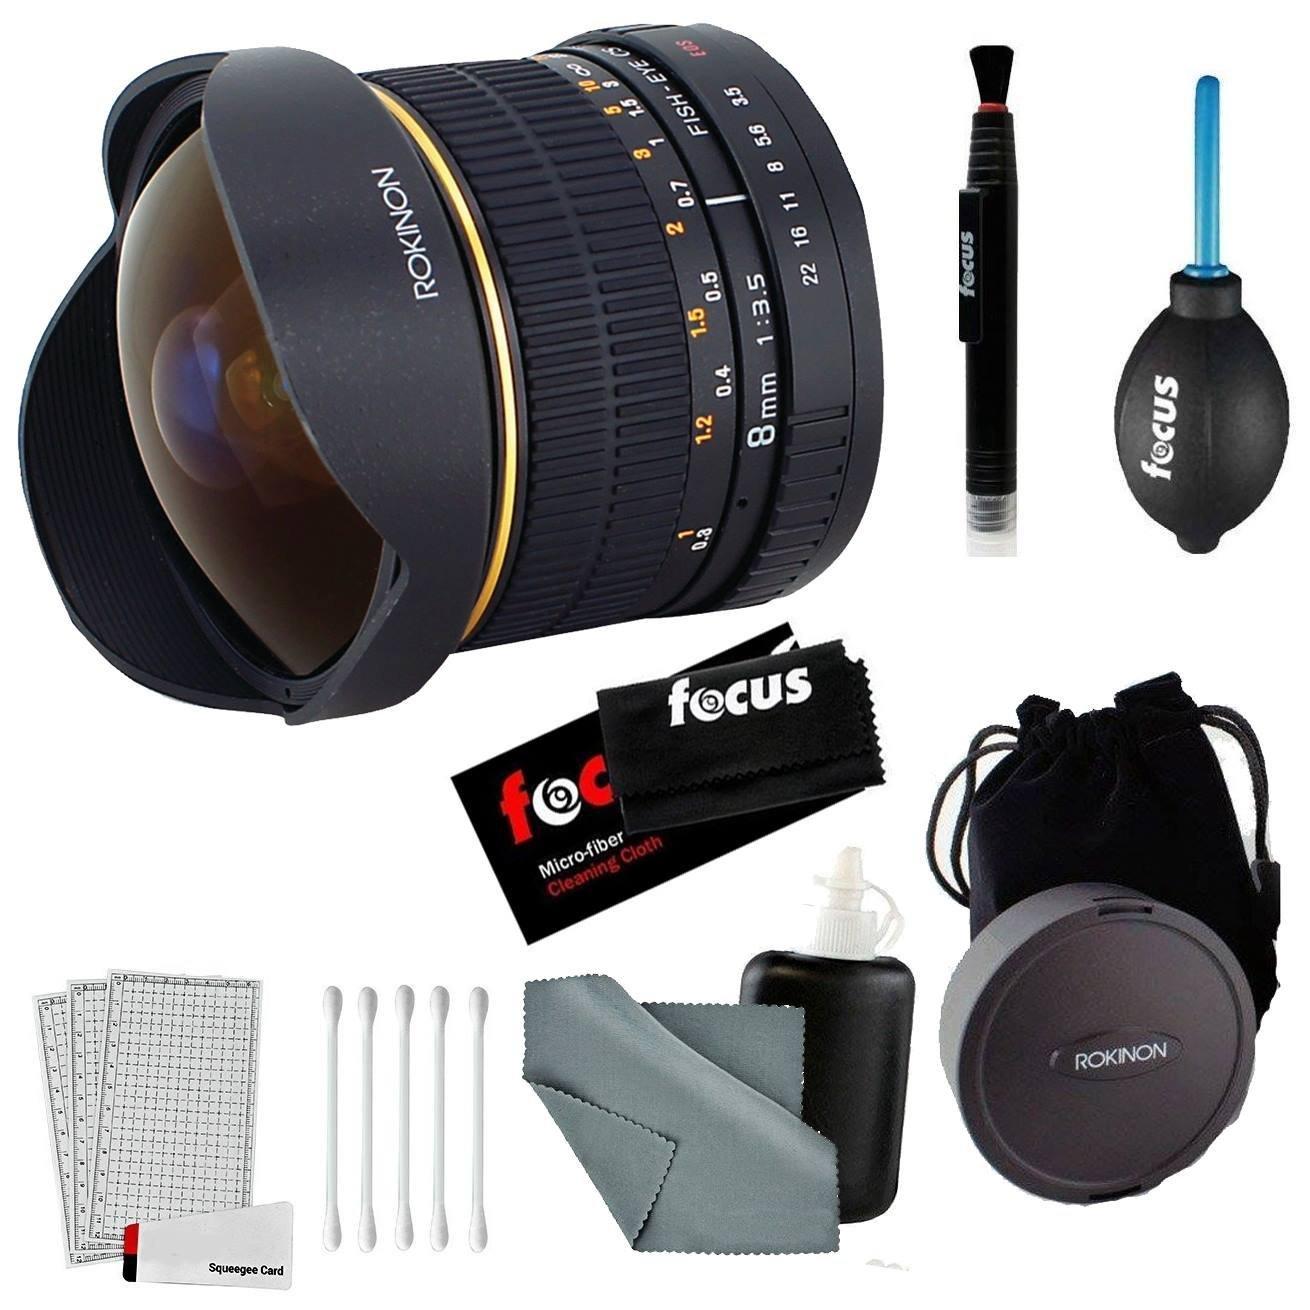 Cheap Ef Fisheye Lens, find Ef Fisheye Lens deals on line at Alibaba.com